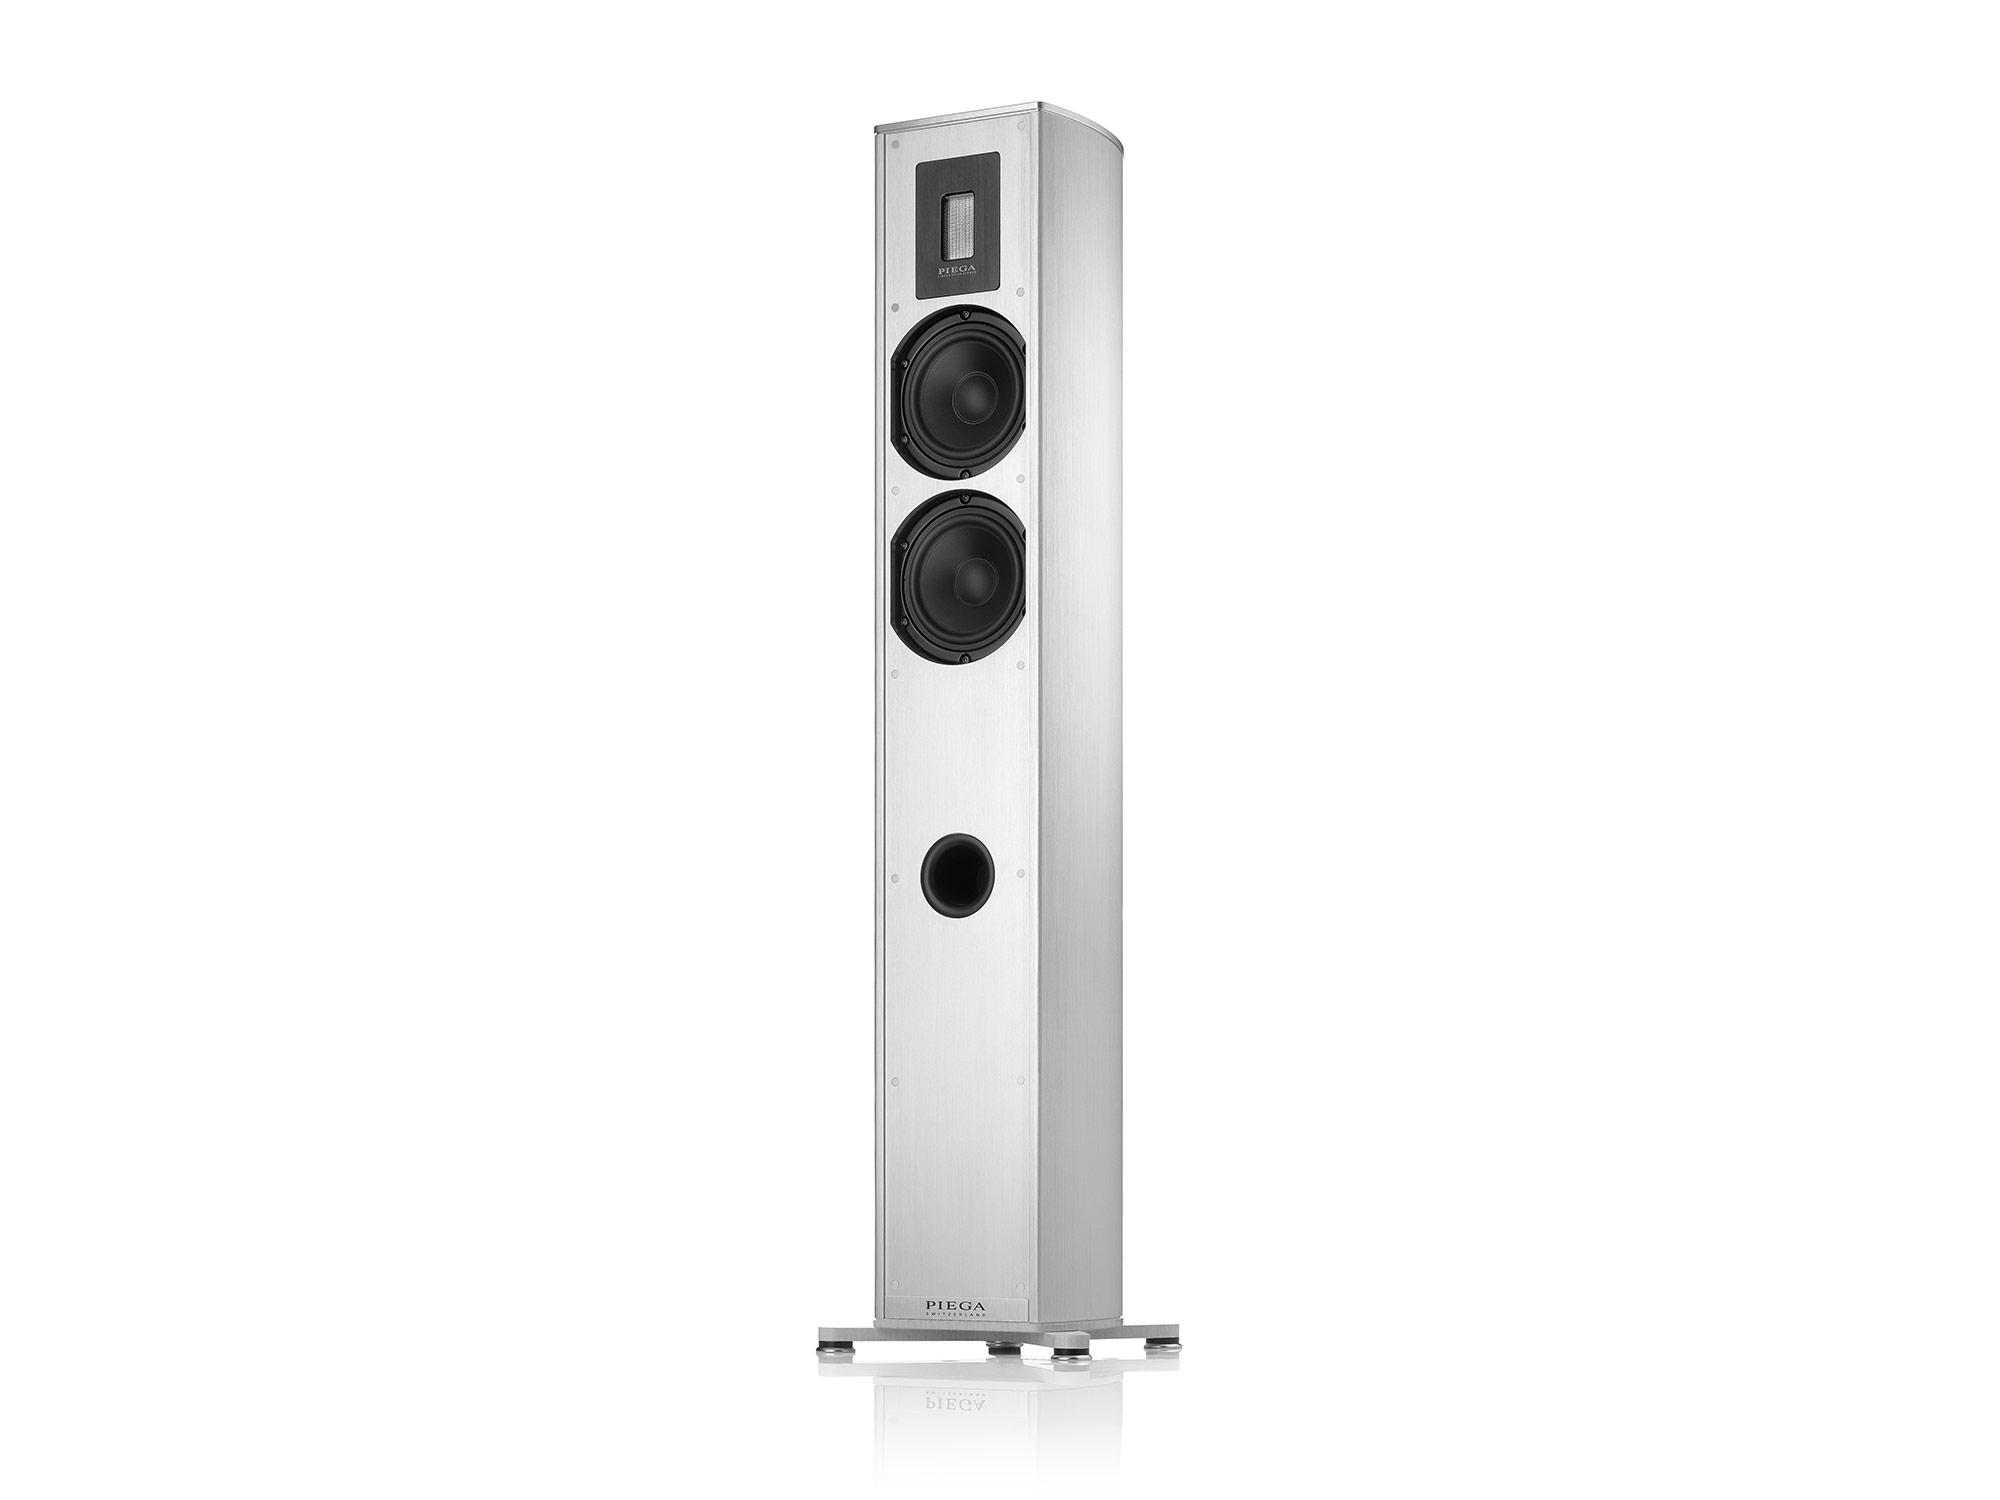 Piega Premium 701 Stand-Lautsprecher Alu, Stoff silber